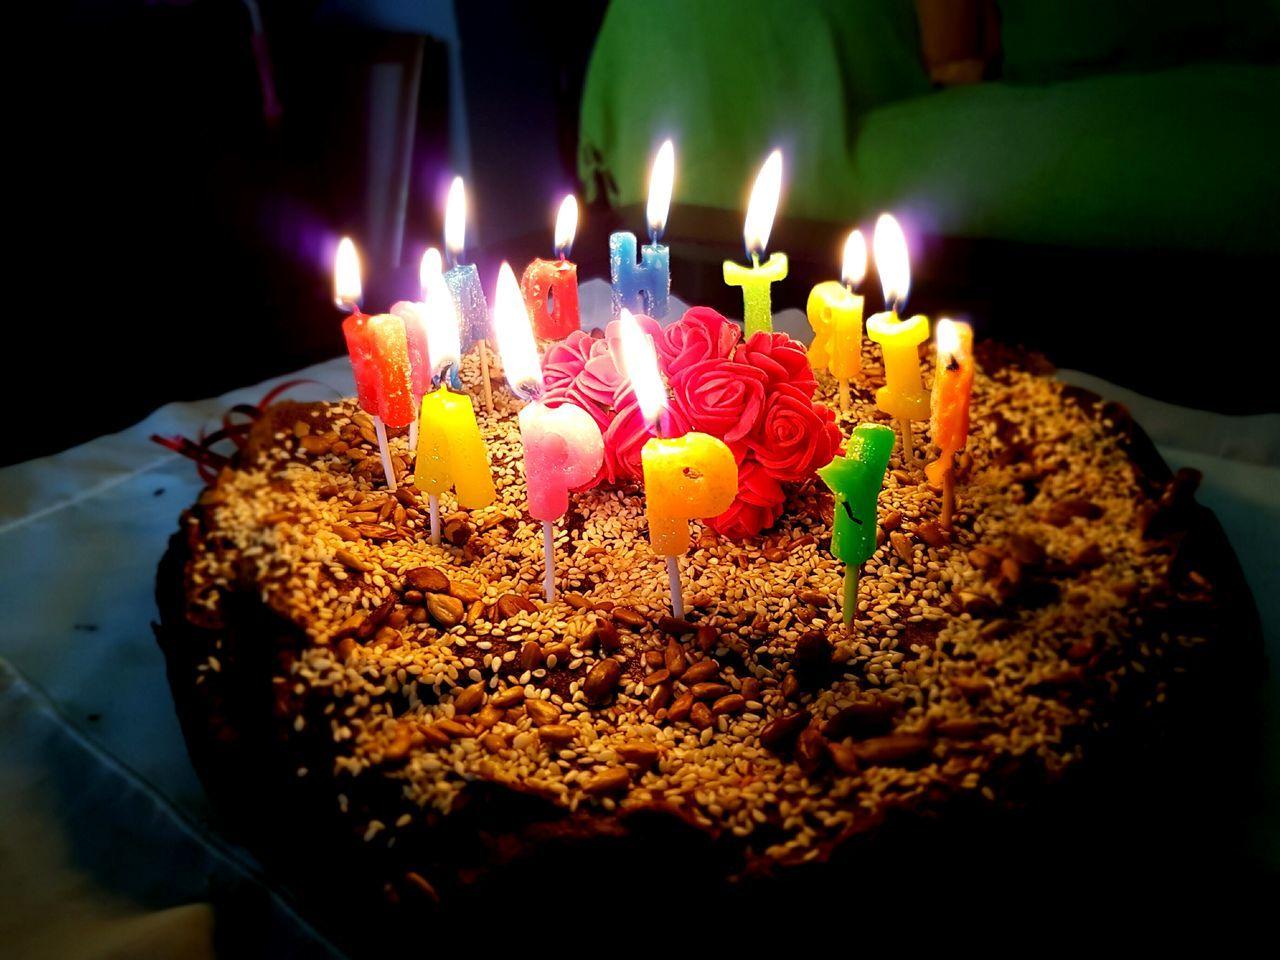 Street Food Worldwide Chrono Chrono Cake Healthy Eating Healthy Food Healthy Lifestyle Bithday Birthday Cake No Chocolate Happiness